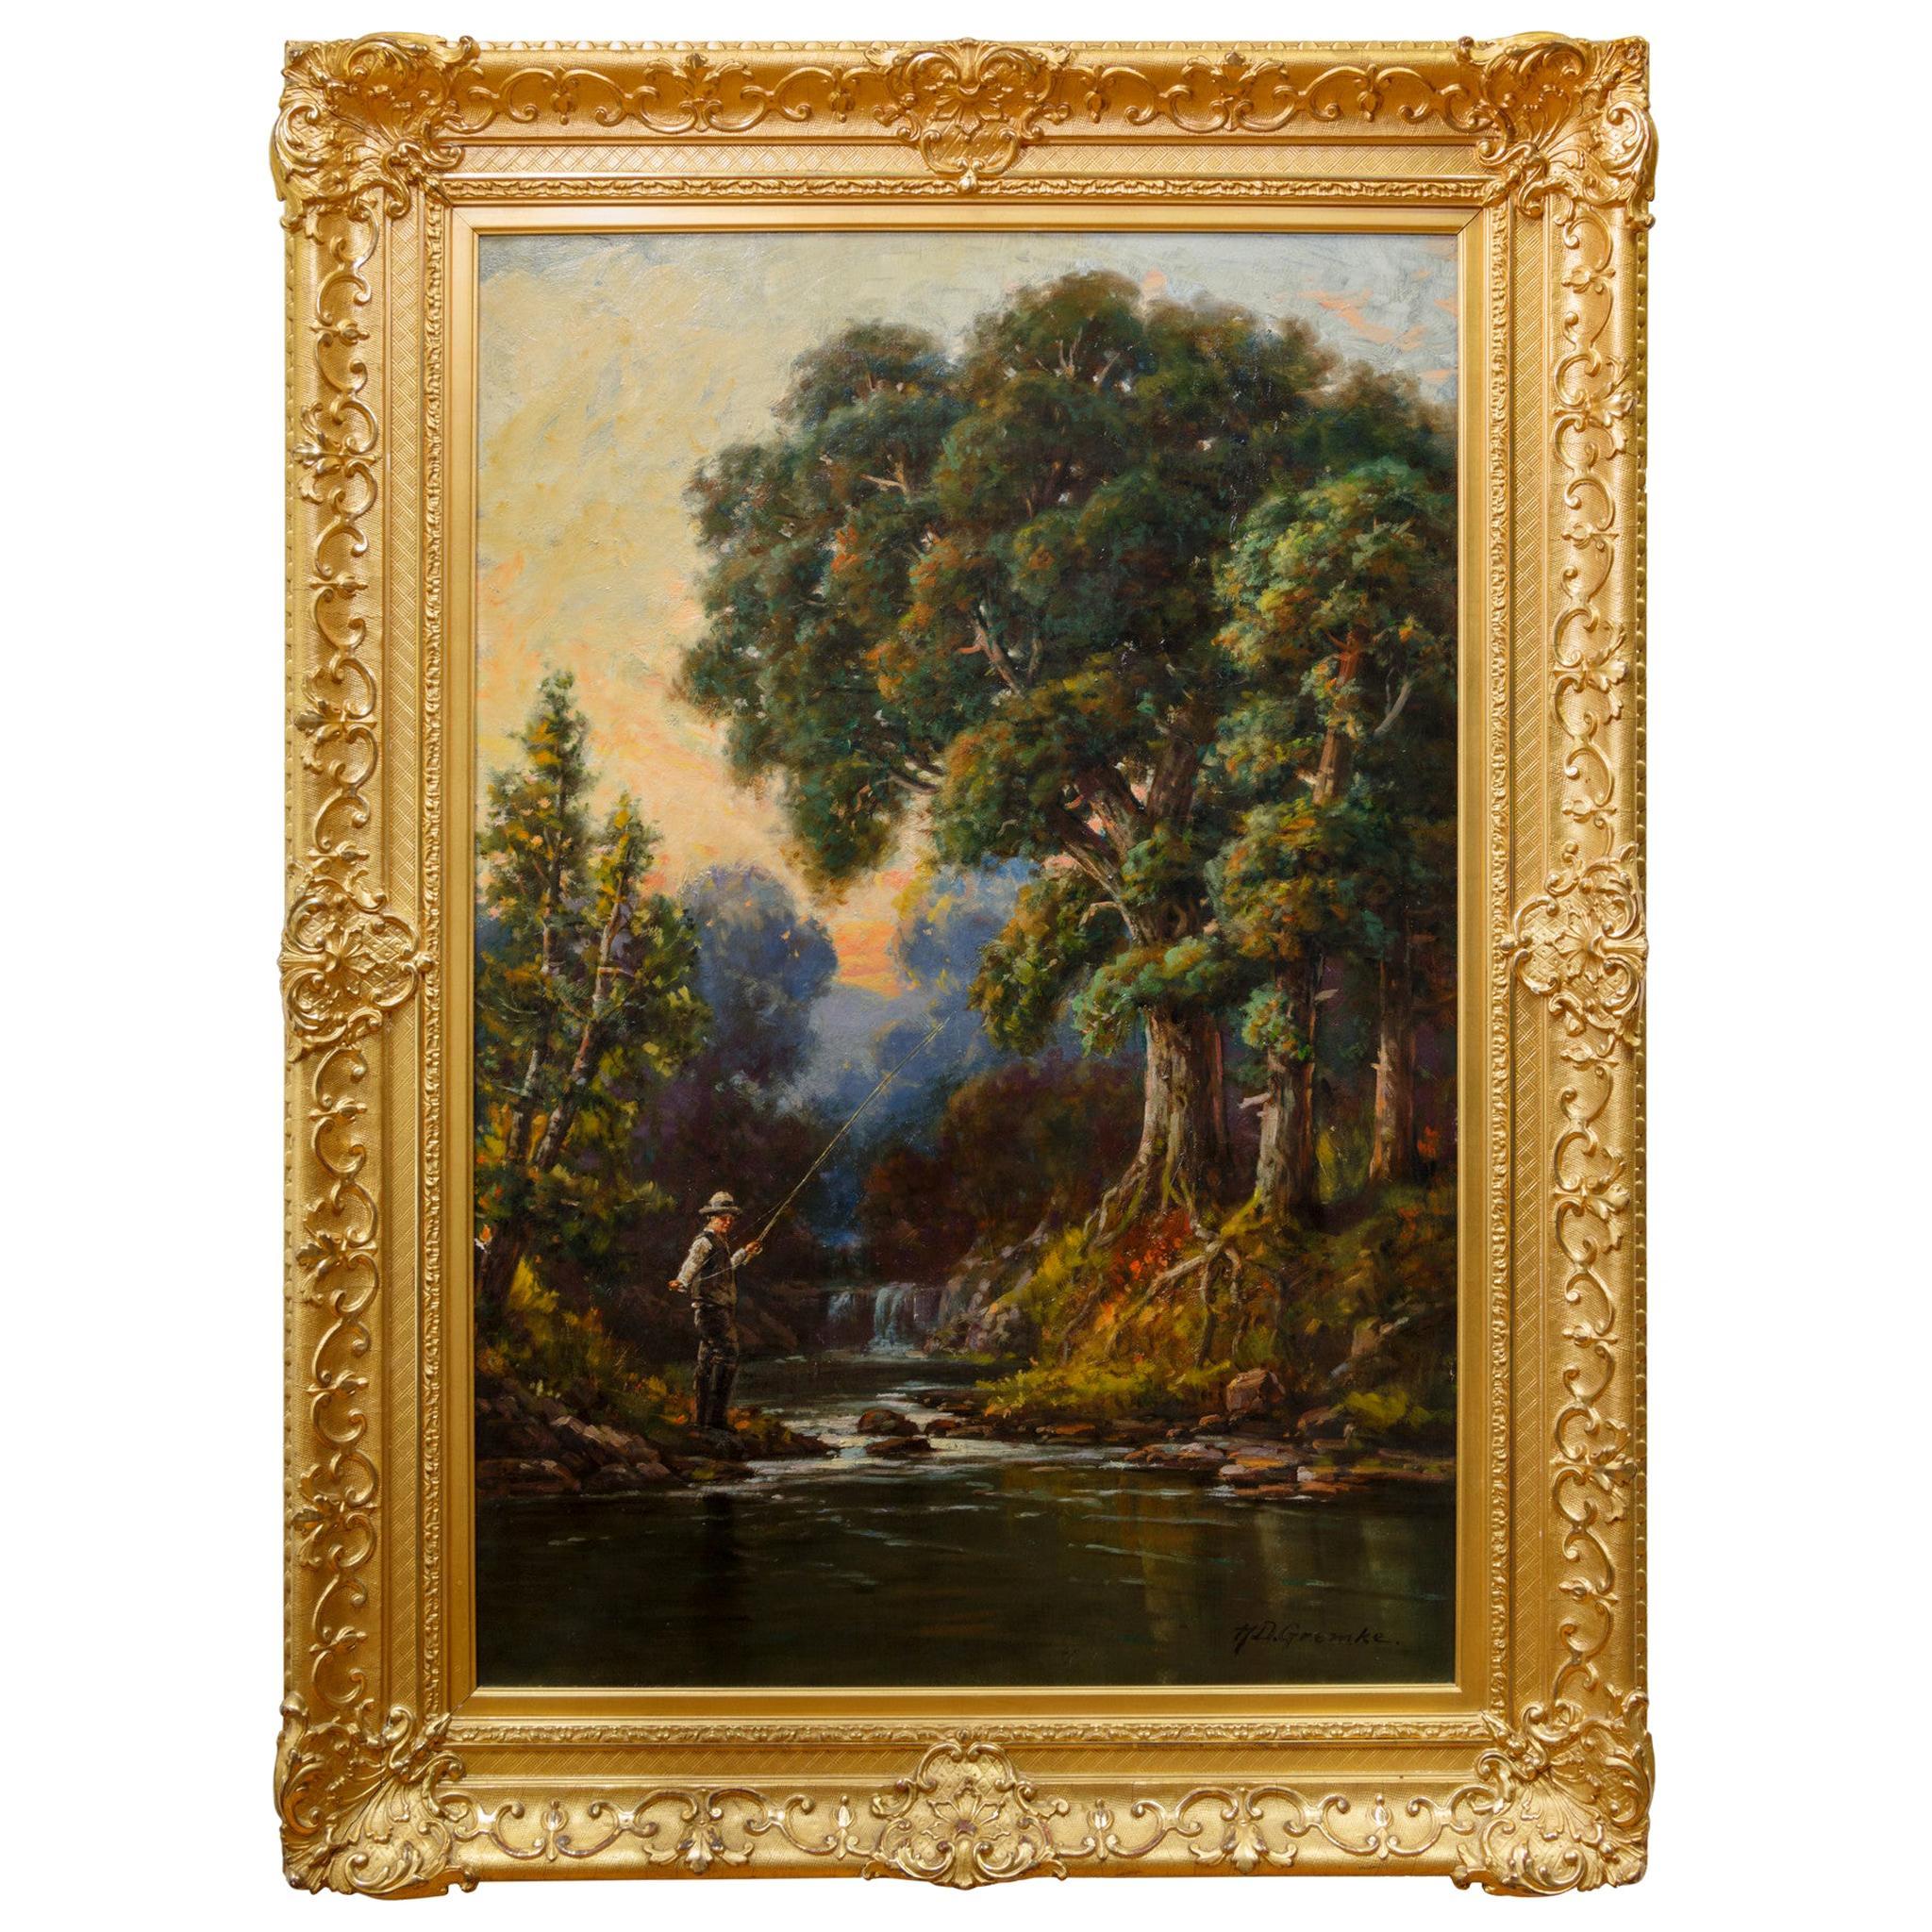 """Boy Fishing in Calm Stream"" Original Oil Painting by Deidrich Henry Gremke"